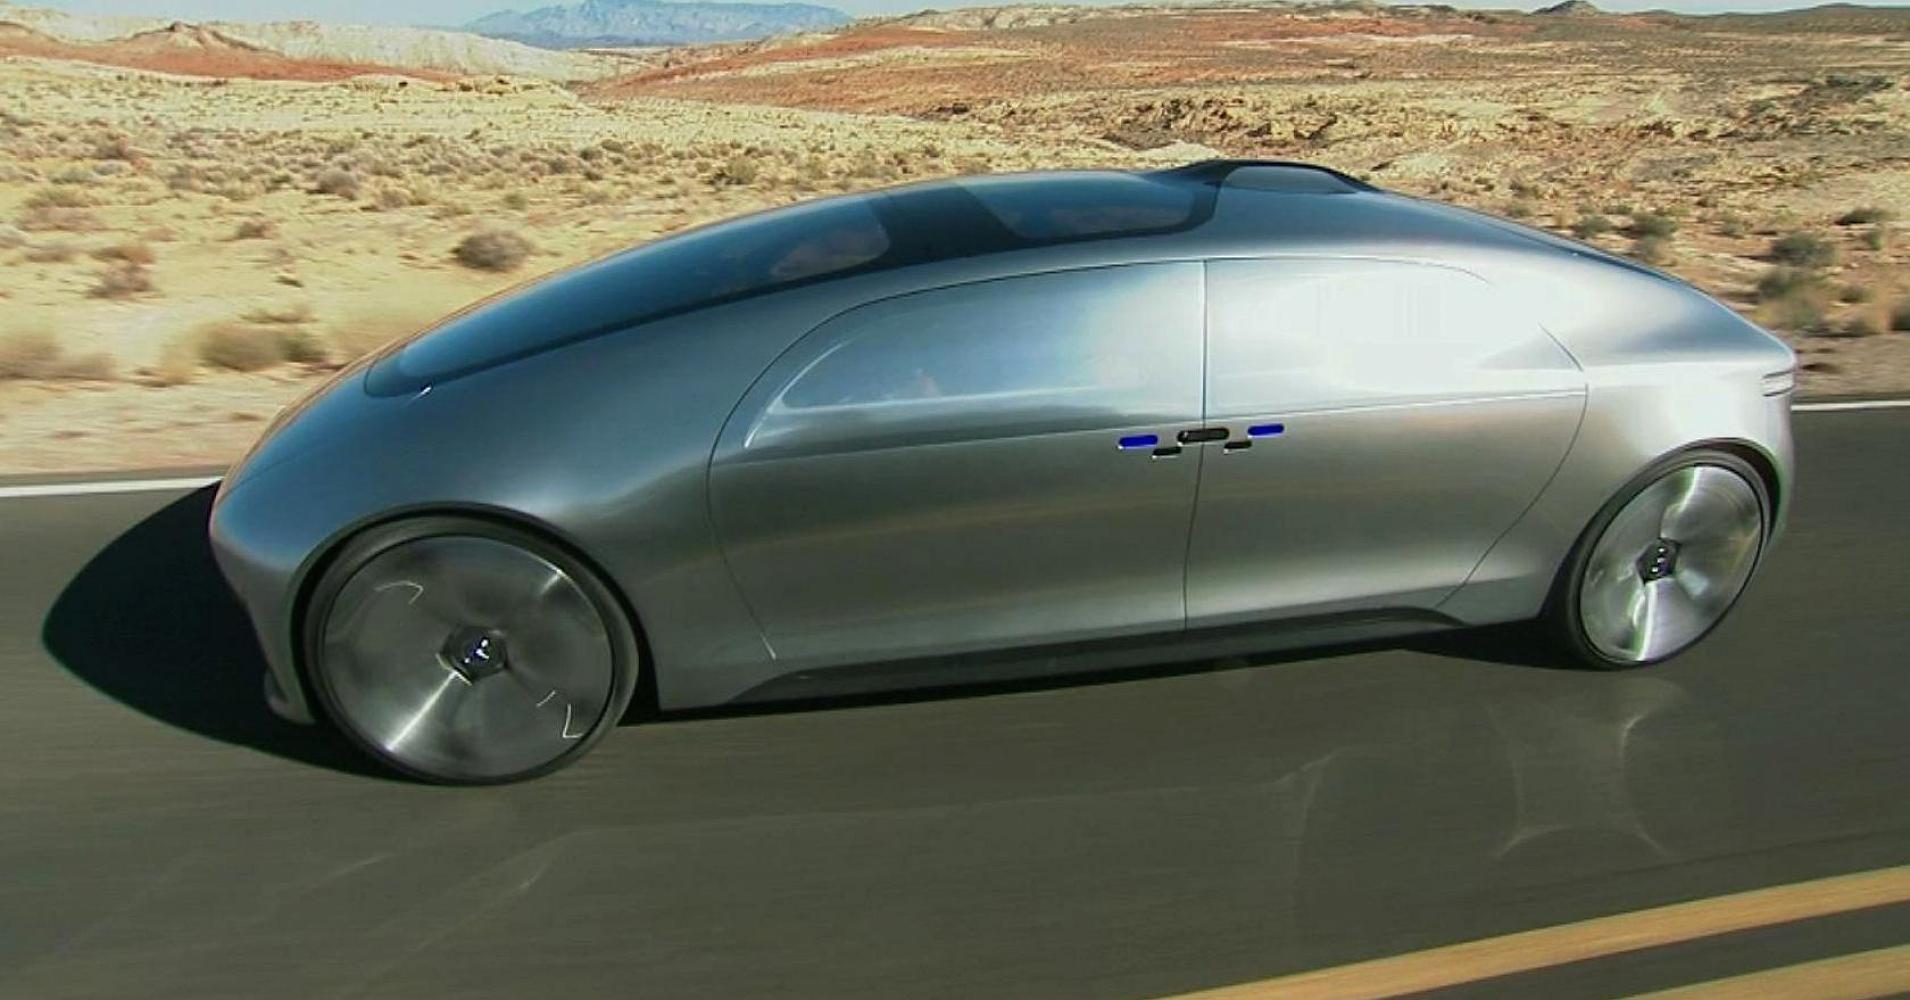 Mercedes f 015 the future of autonomous cars for Mercedes benz retail careers